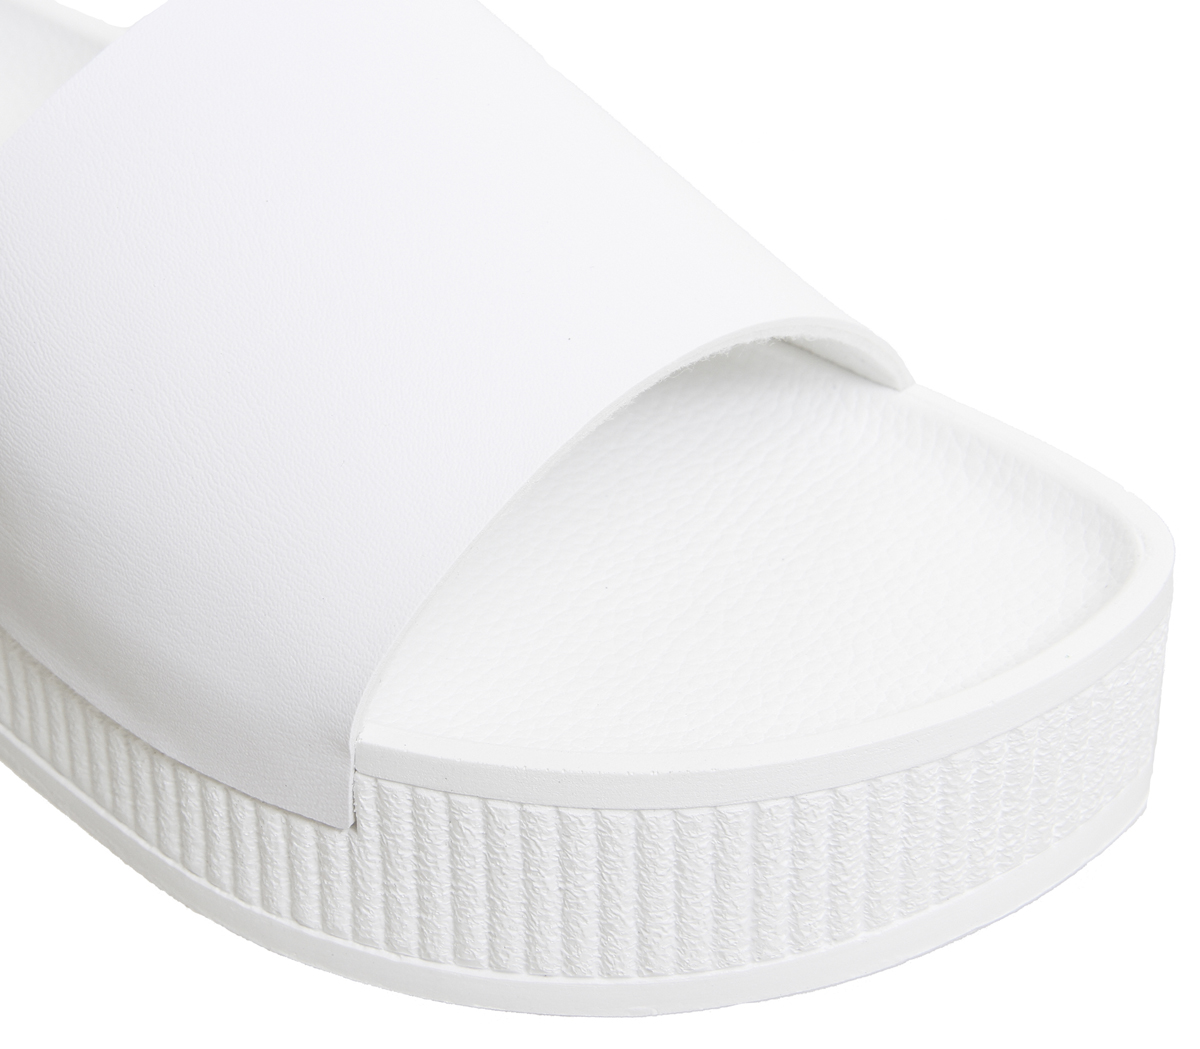 3e553df43d Womens-Office-Mushroom-Flatform-Sandals-White-Heels thumbnail 7